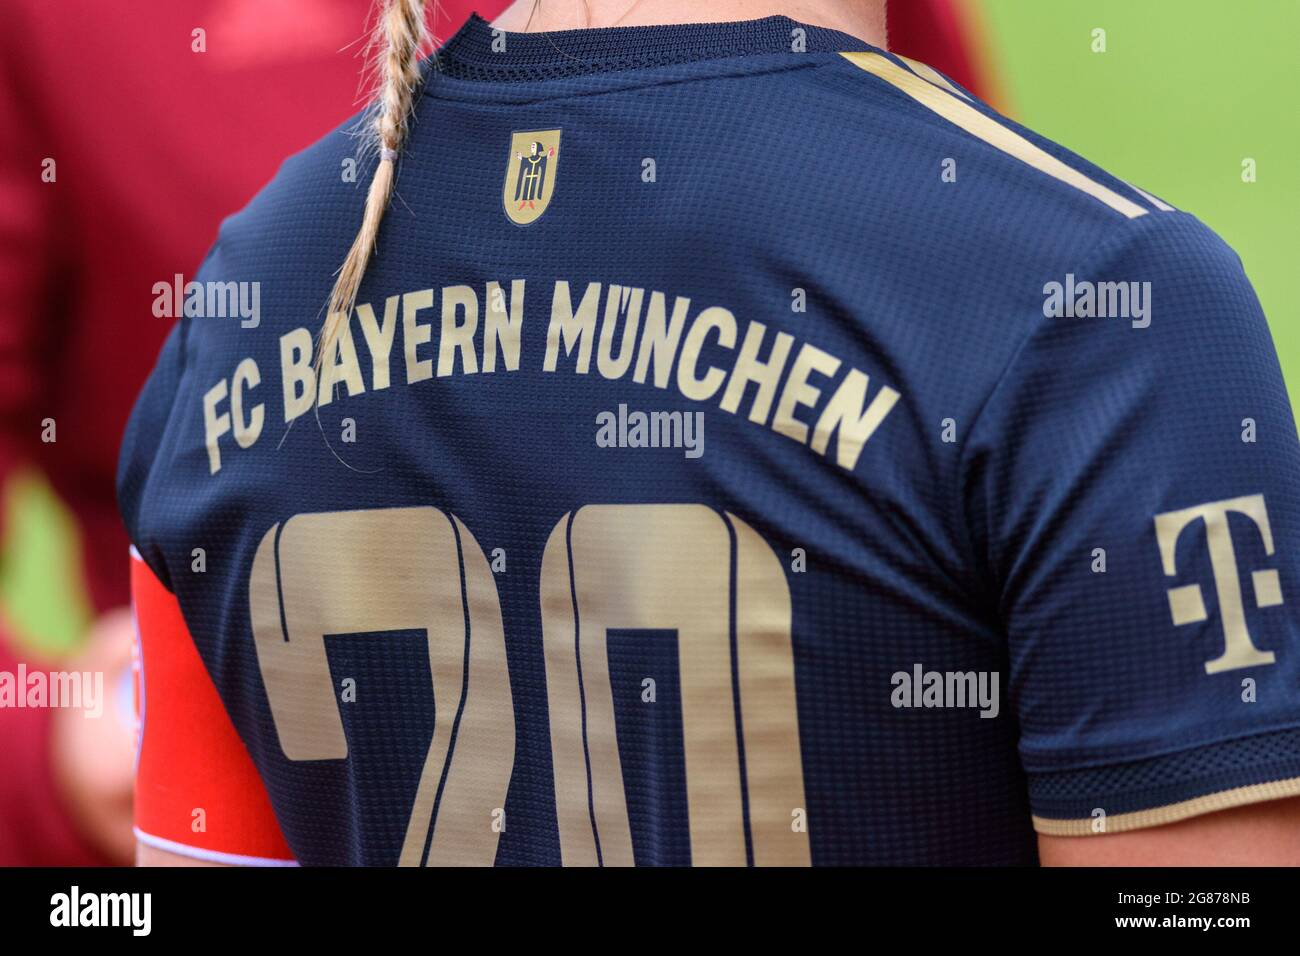 Fc Bayern Munich Shirt High Resolution Stock Photography and ...